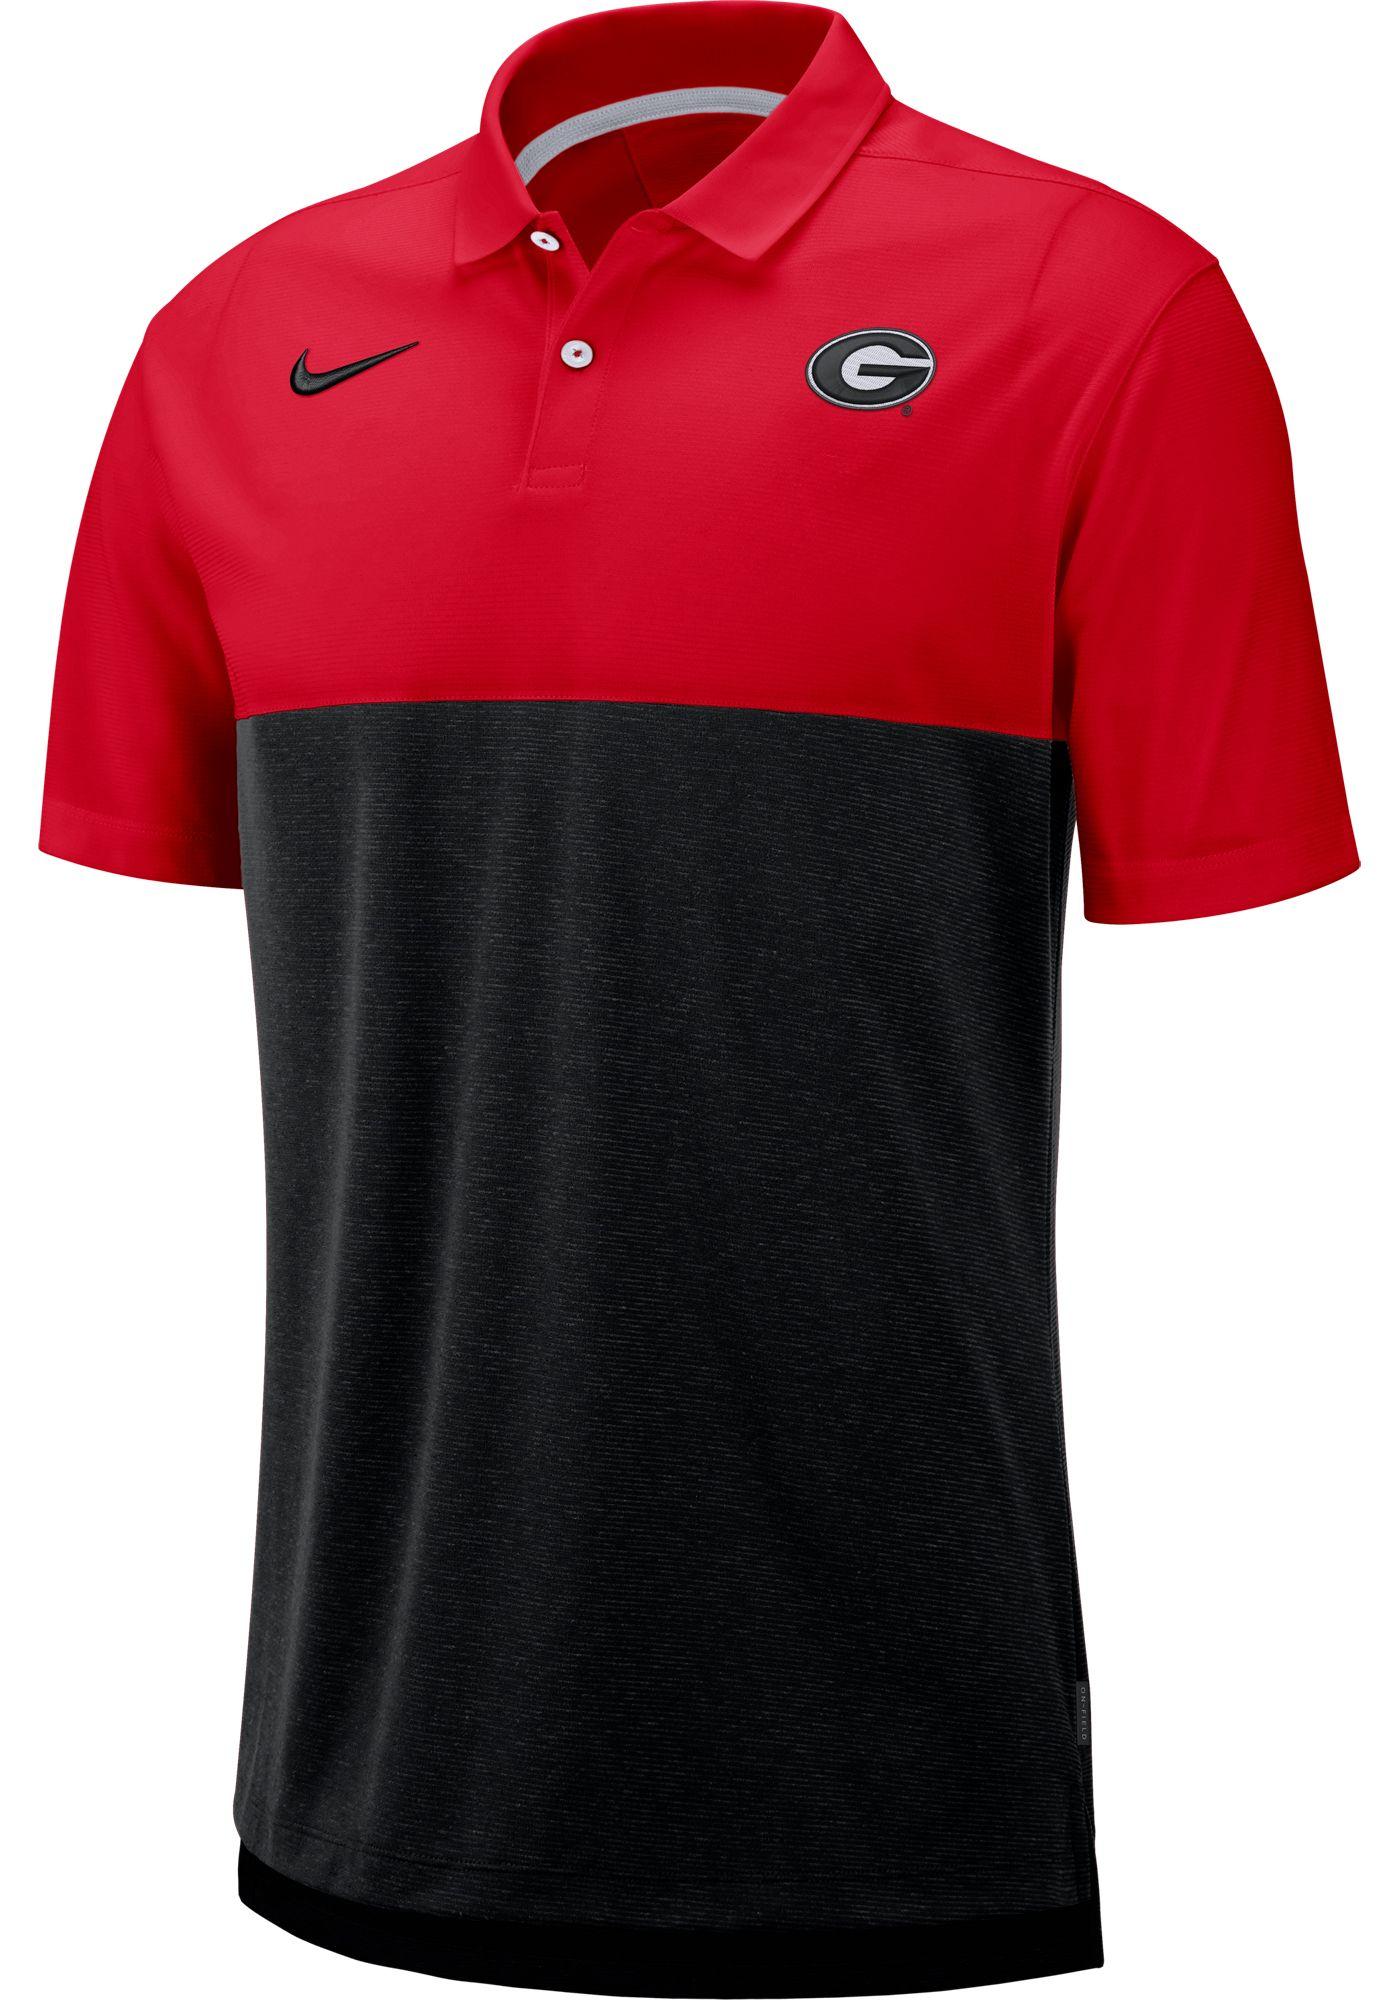 Nike Men's Georgia Bulldogs Red/Black Dri-FIT Breathe Football Sideline Polo